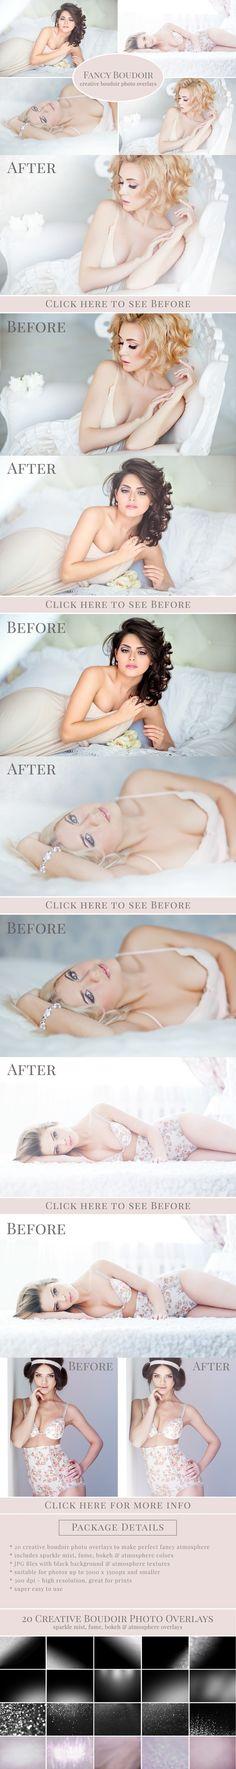 """Fancy Boudoir"" photo overlays. Photoshop Layer Styles. $15.00"